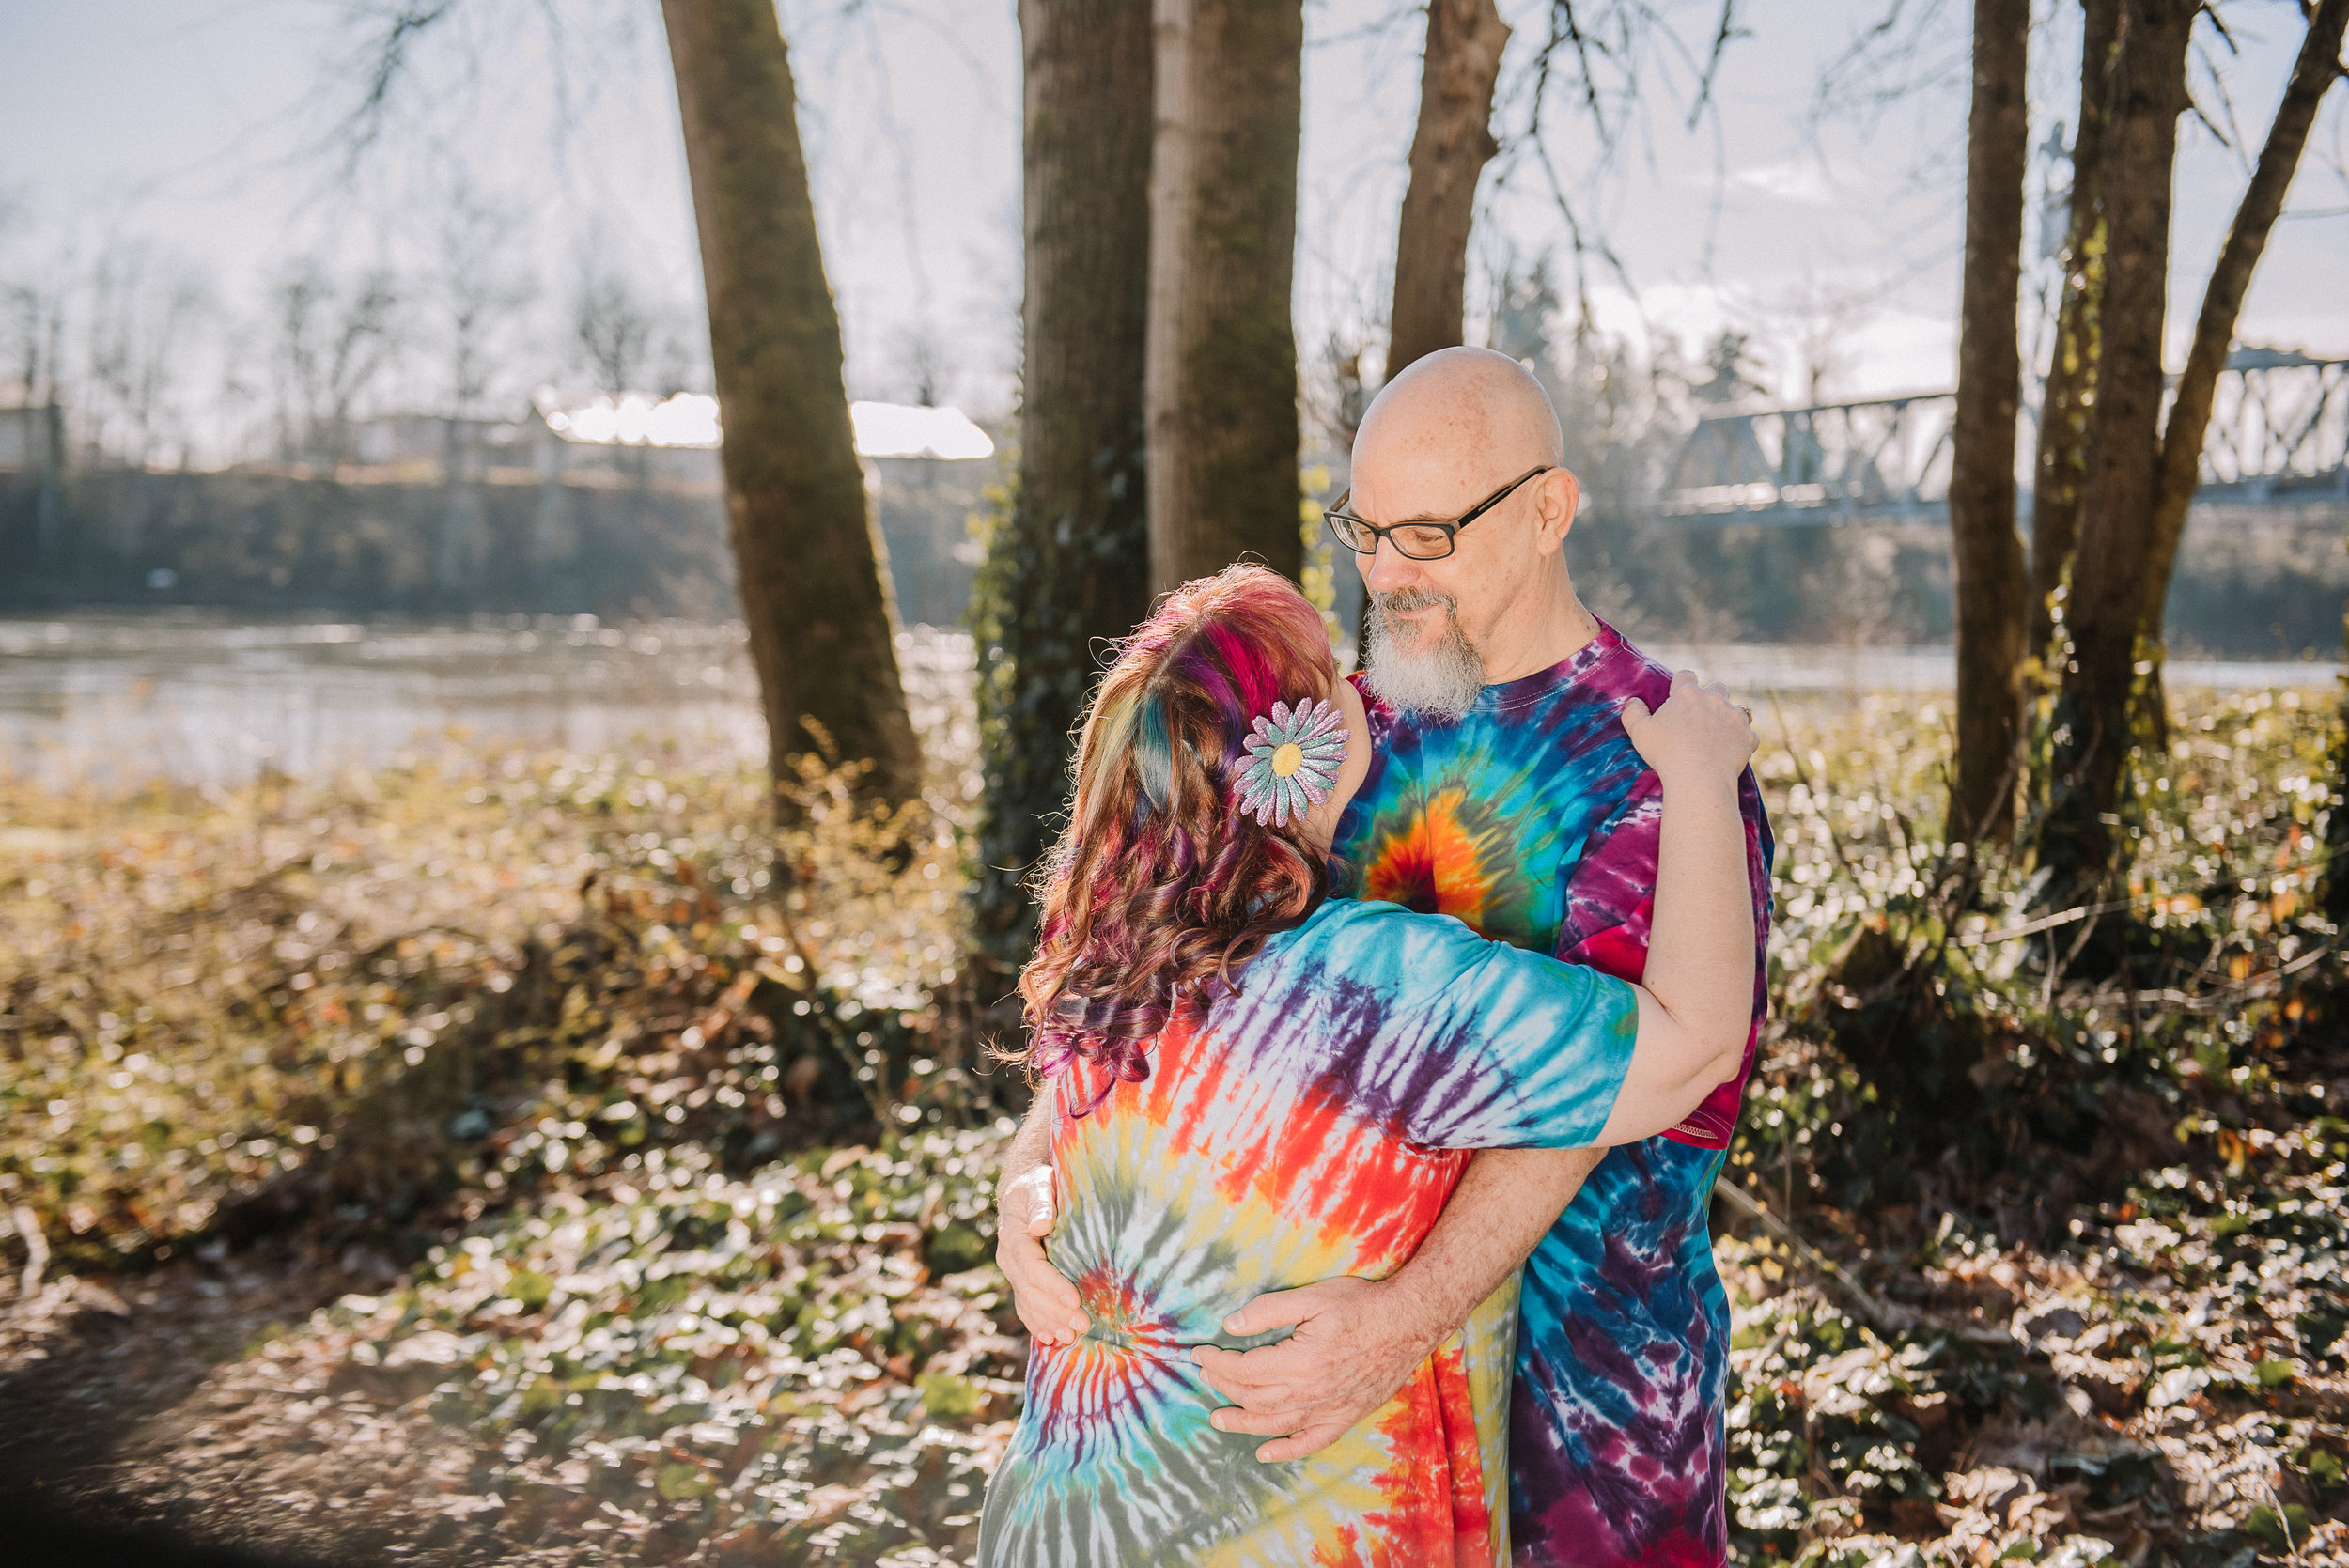 Gina+Daniel Wedding_2018-03-10-49.jpg